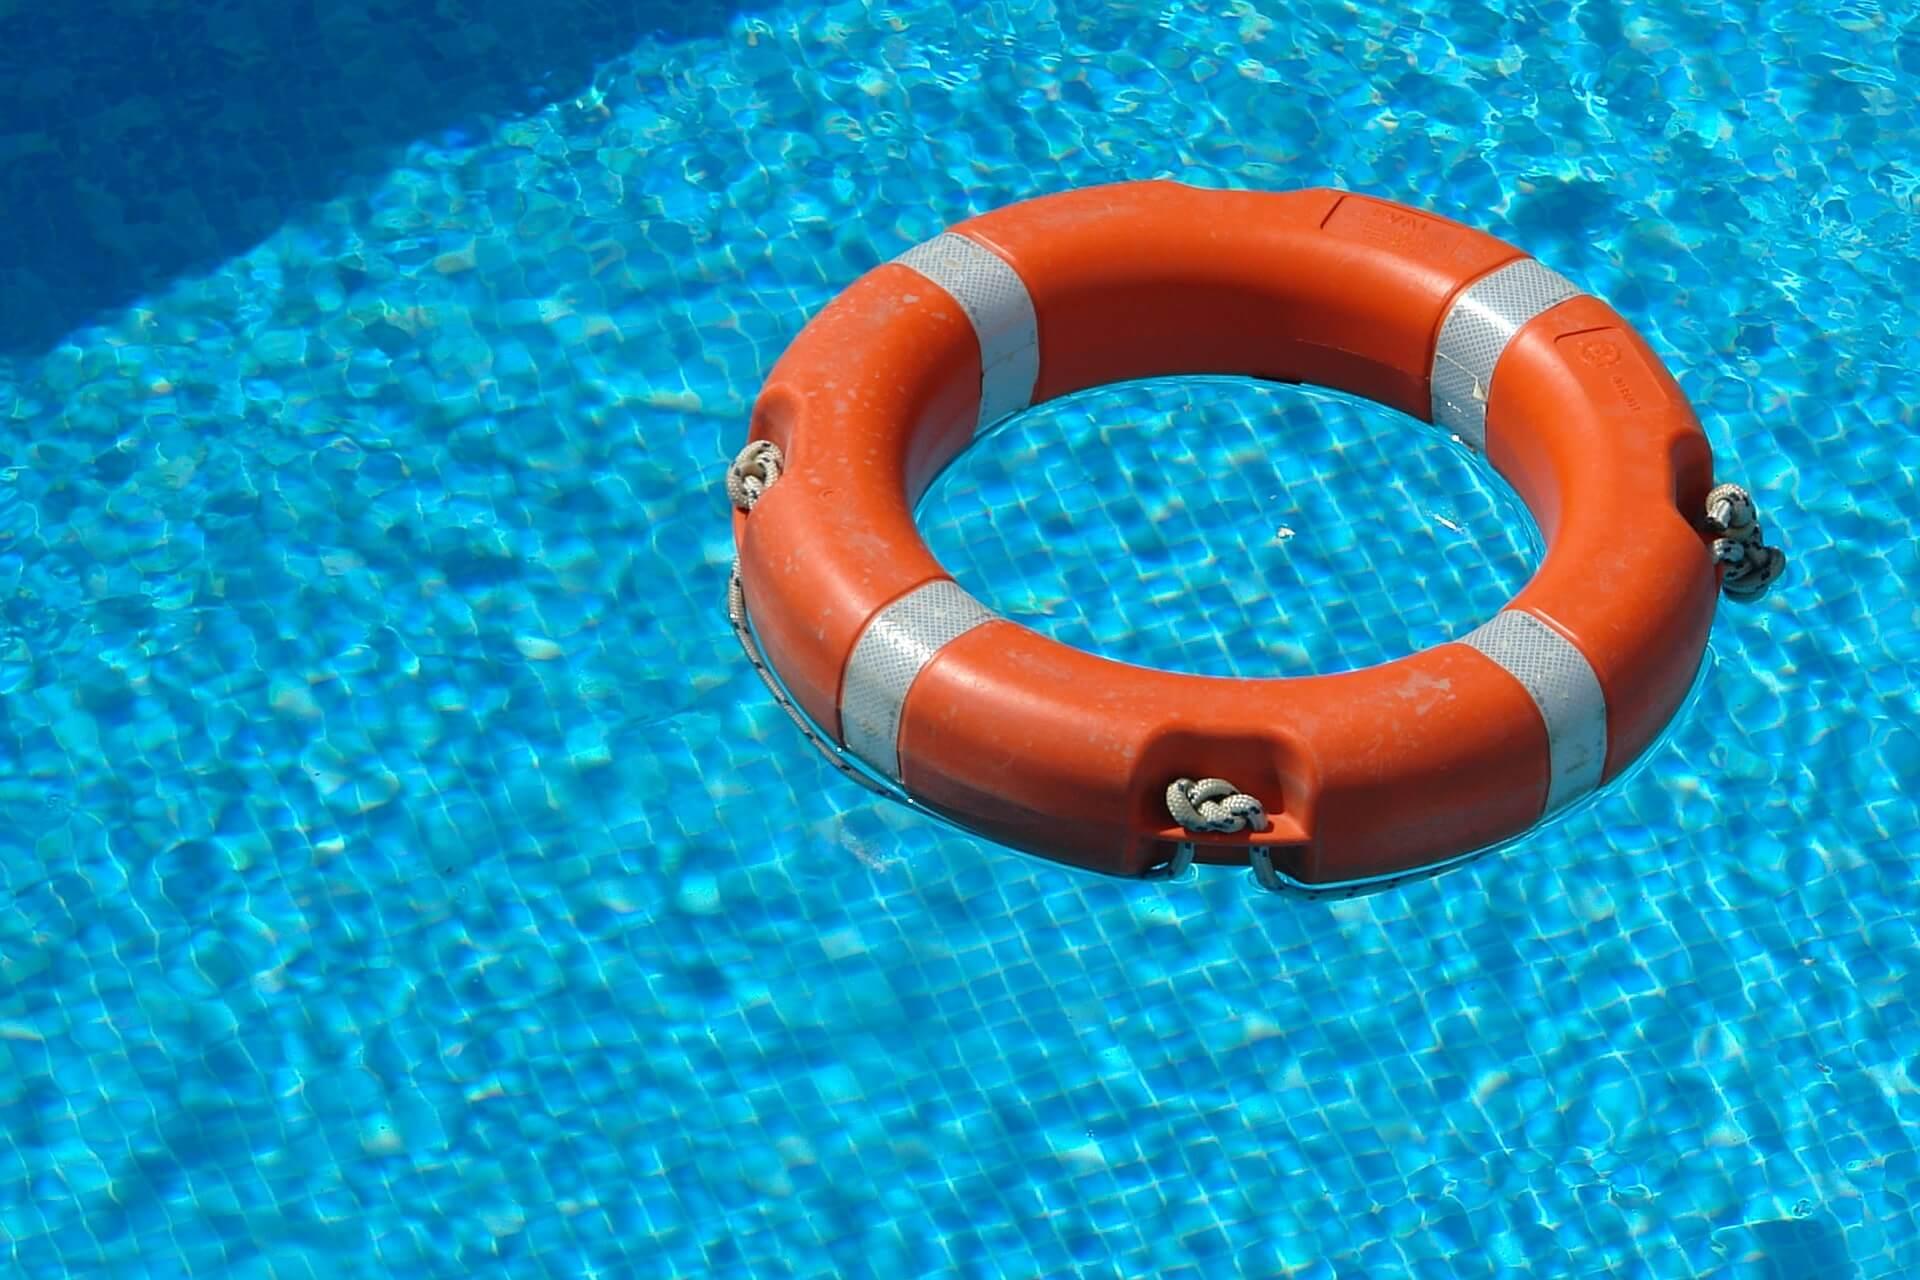 lifesaver floating in pool